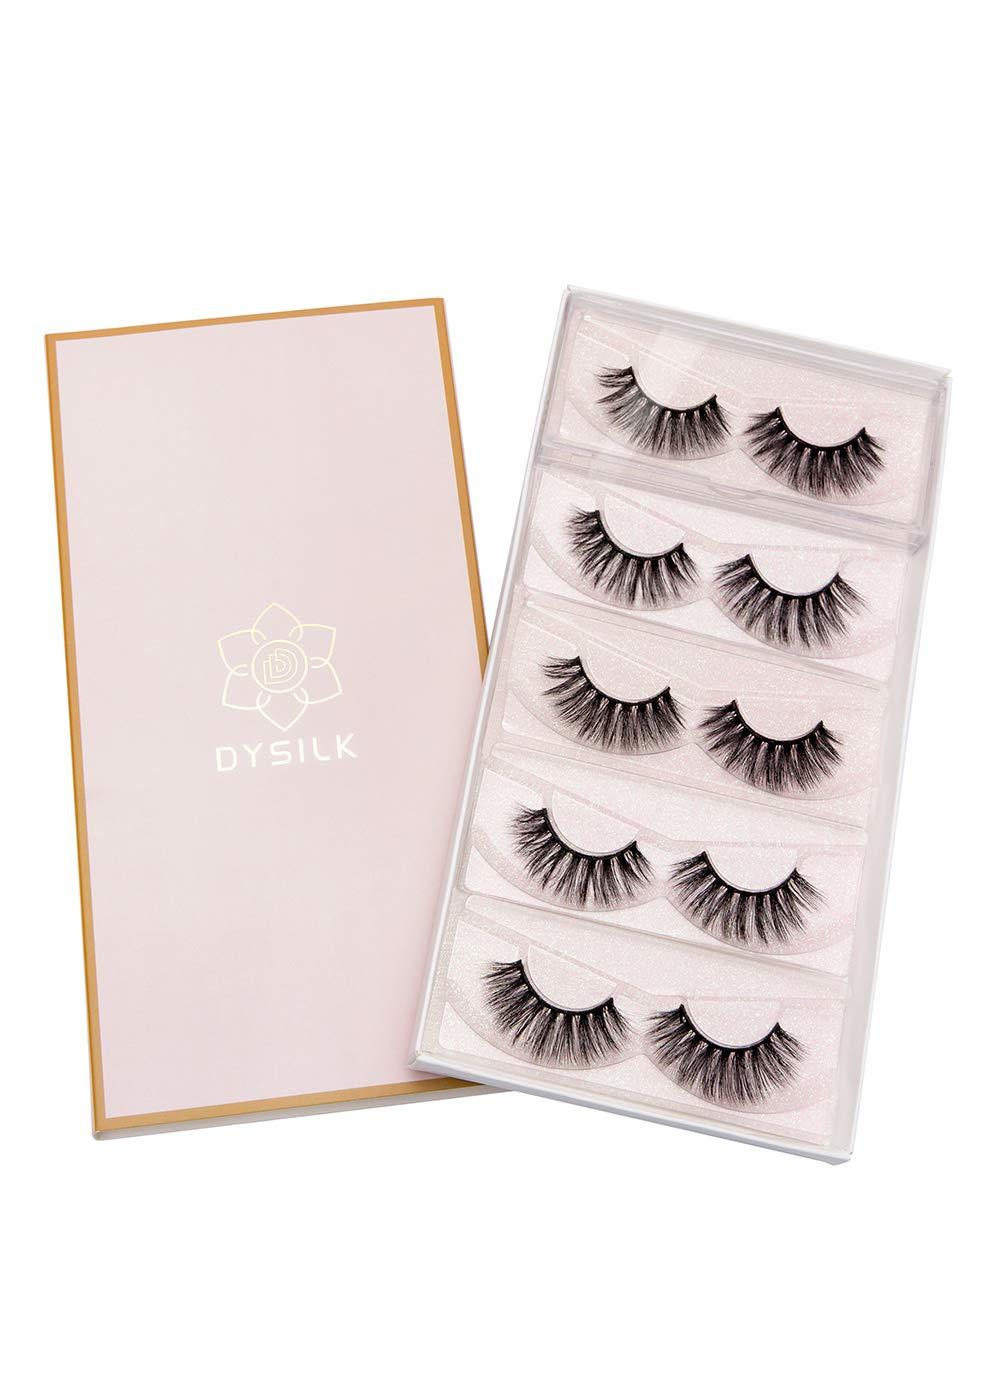 DYSILK 3D Eyelashes Dramatic Look False Eyelashes Extension Makeup Long Handmade Fake Eyelashes Fluffy Soft Reusable Black 5 Pairs